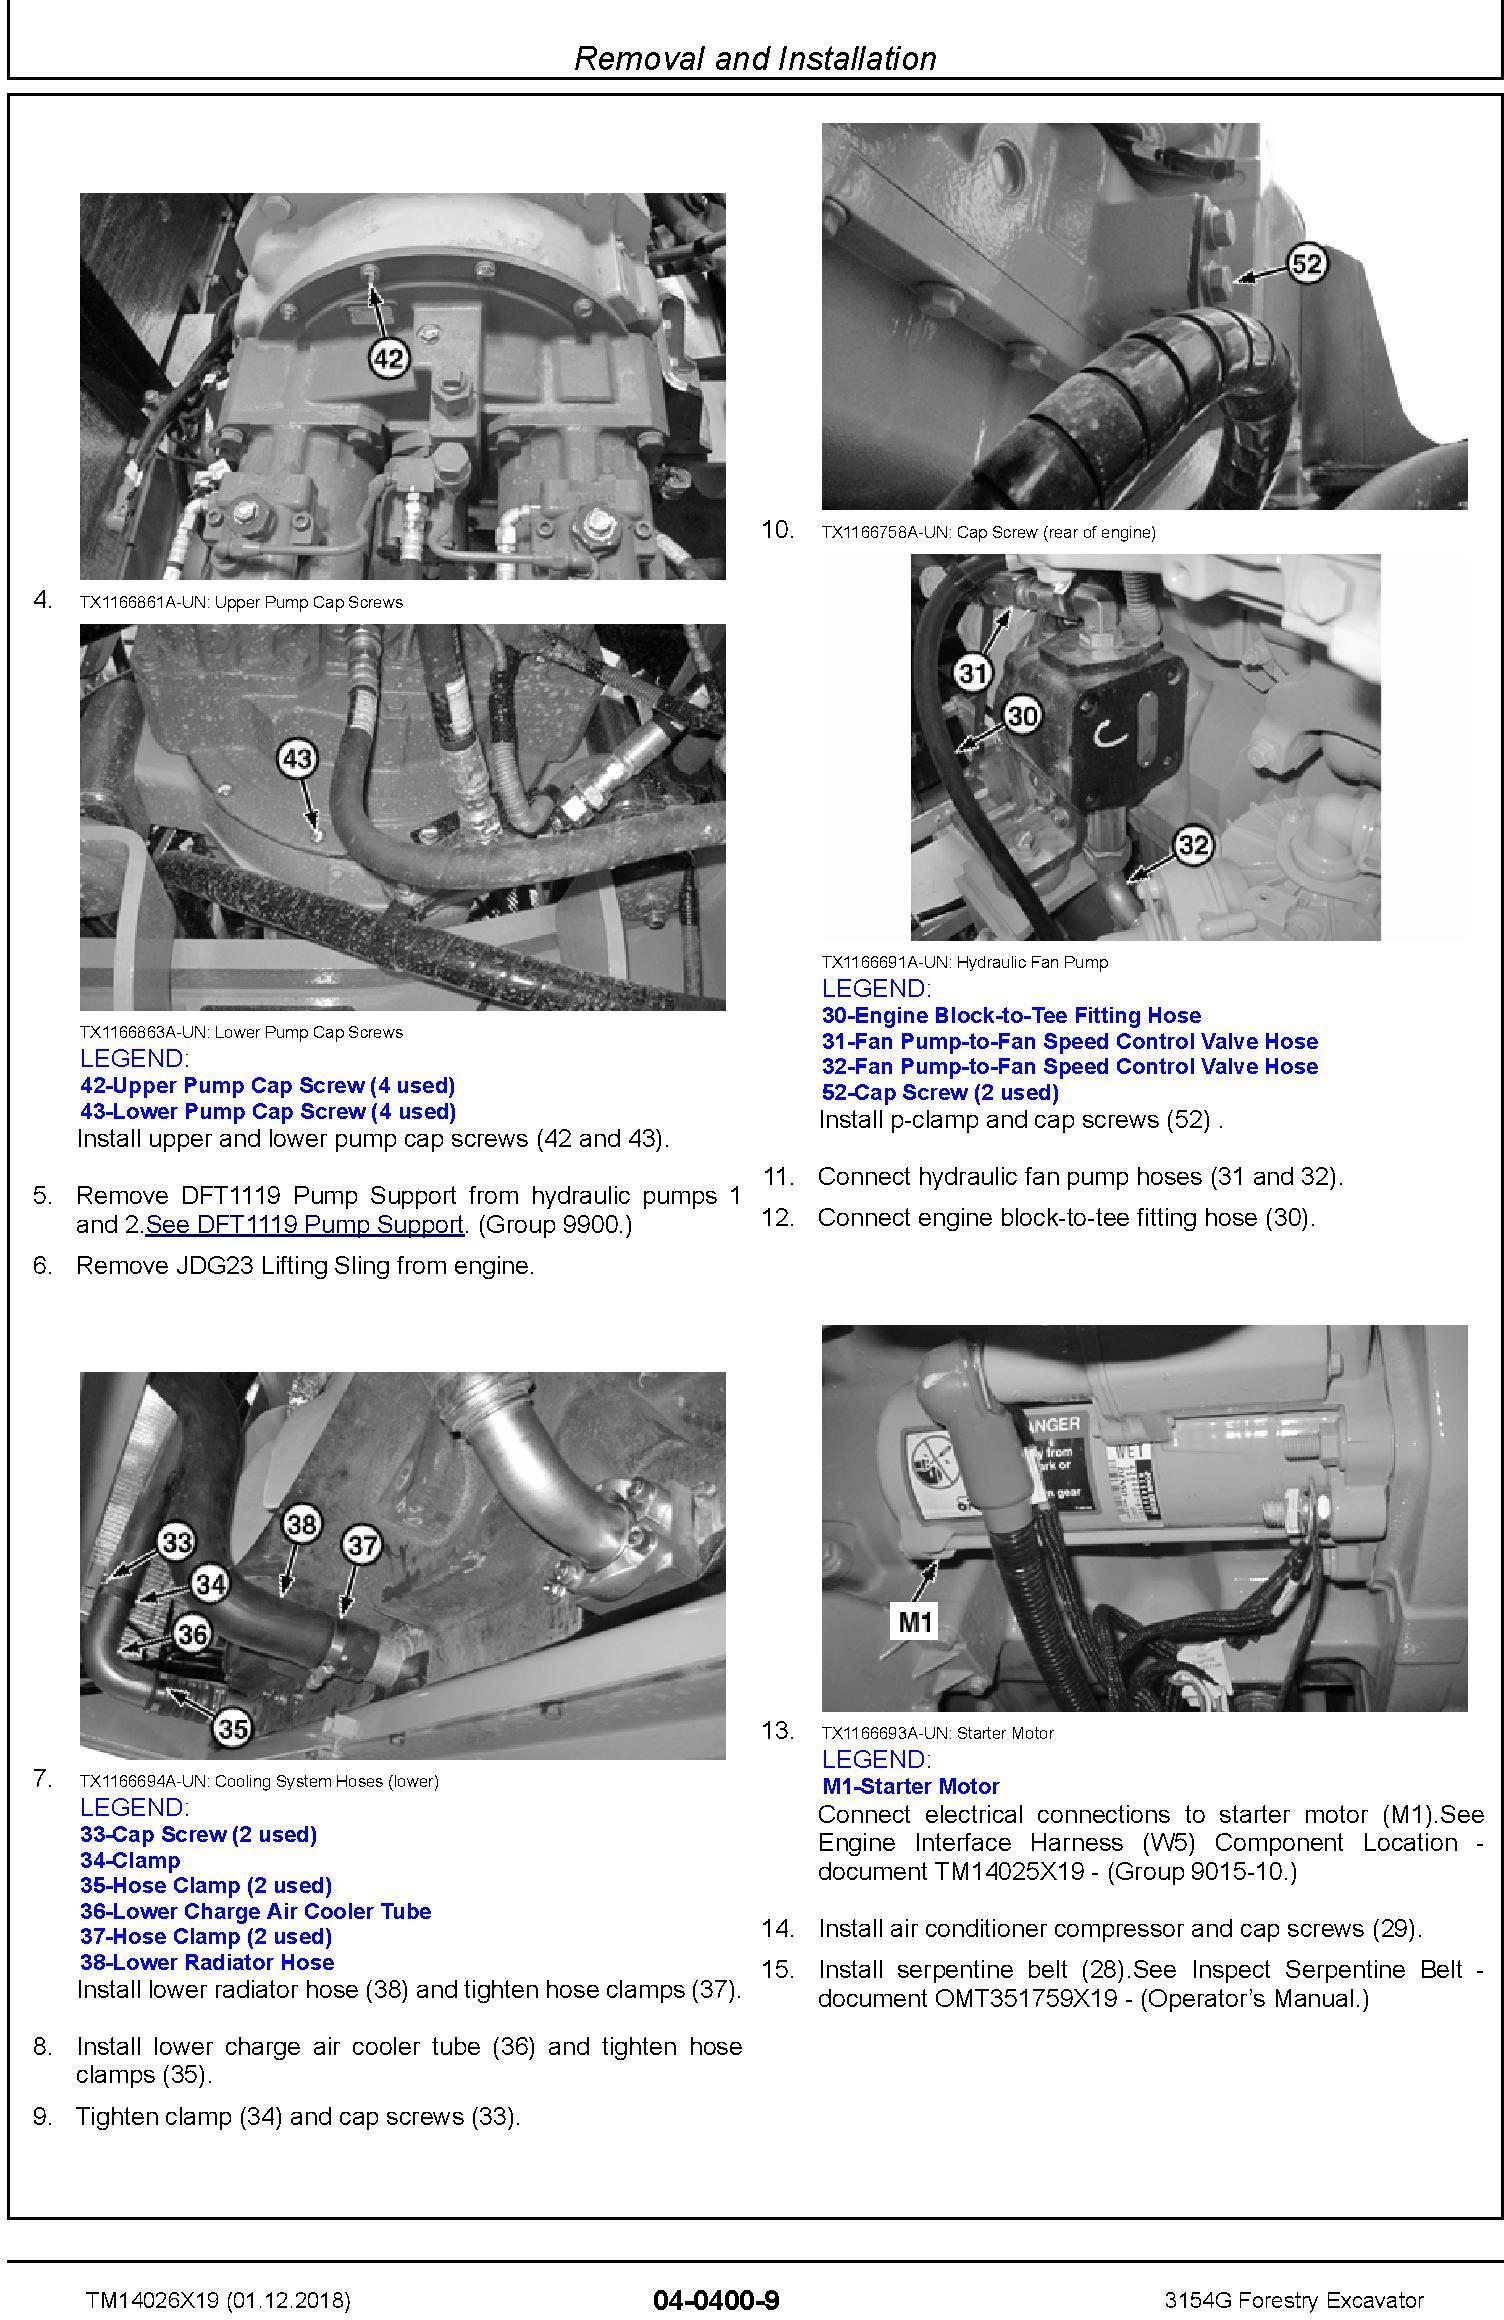 John Deere 3154G (SN. F310001-) Forestry Excavator Repair Technical Service Manual (TM14026X19) - 3